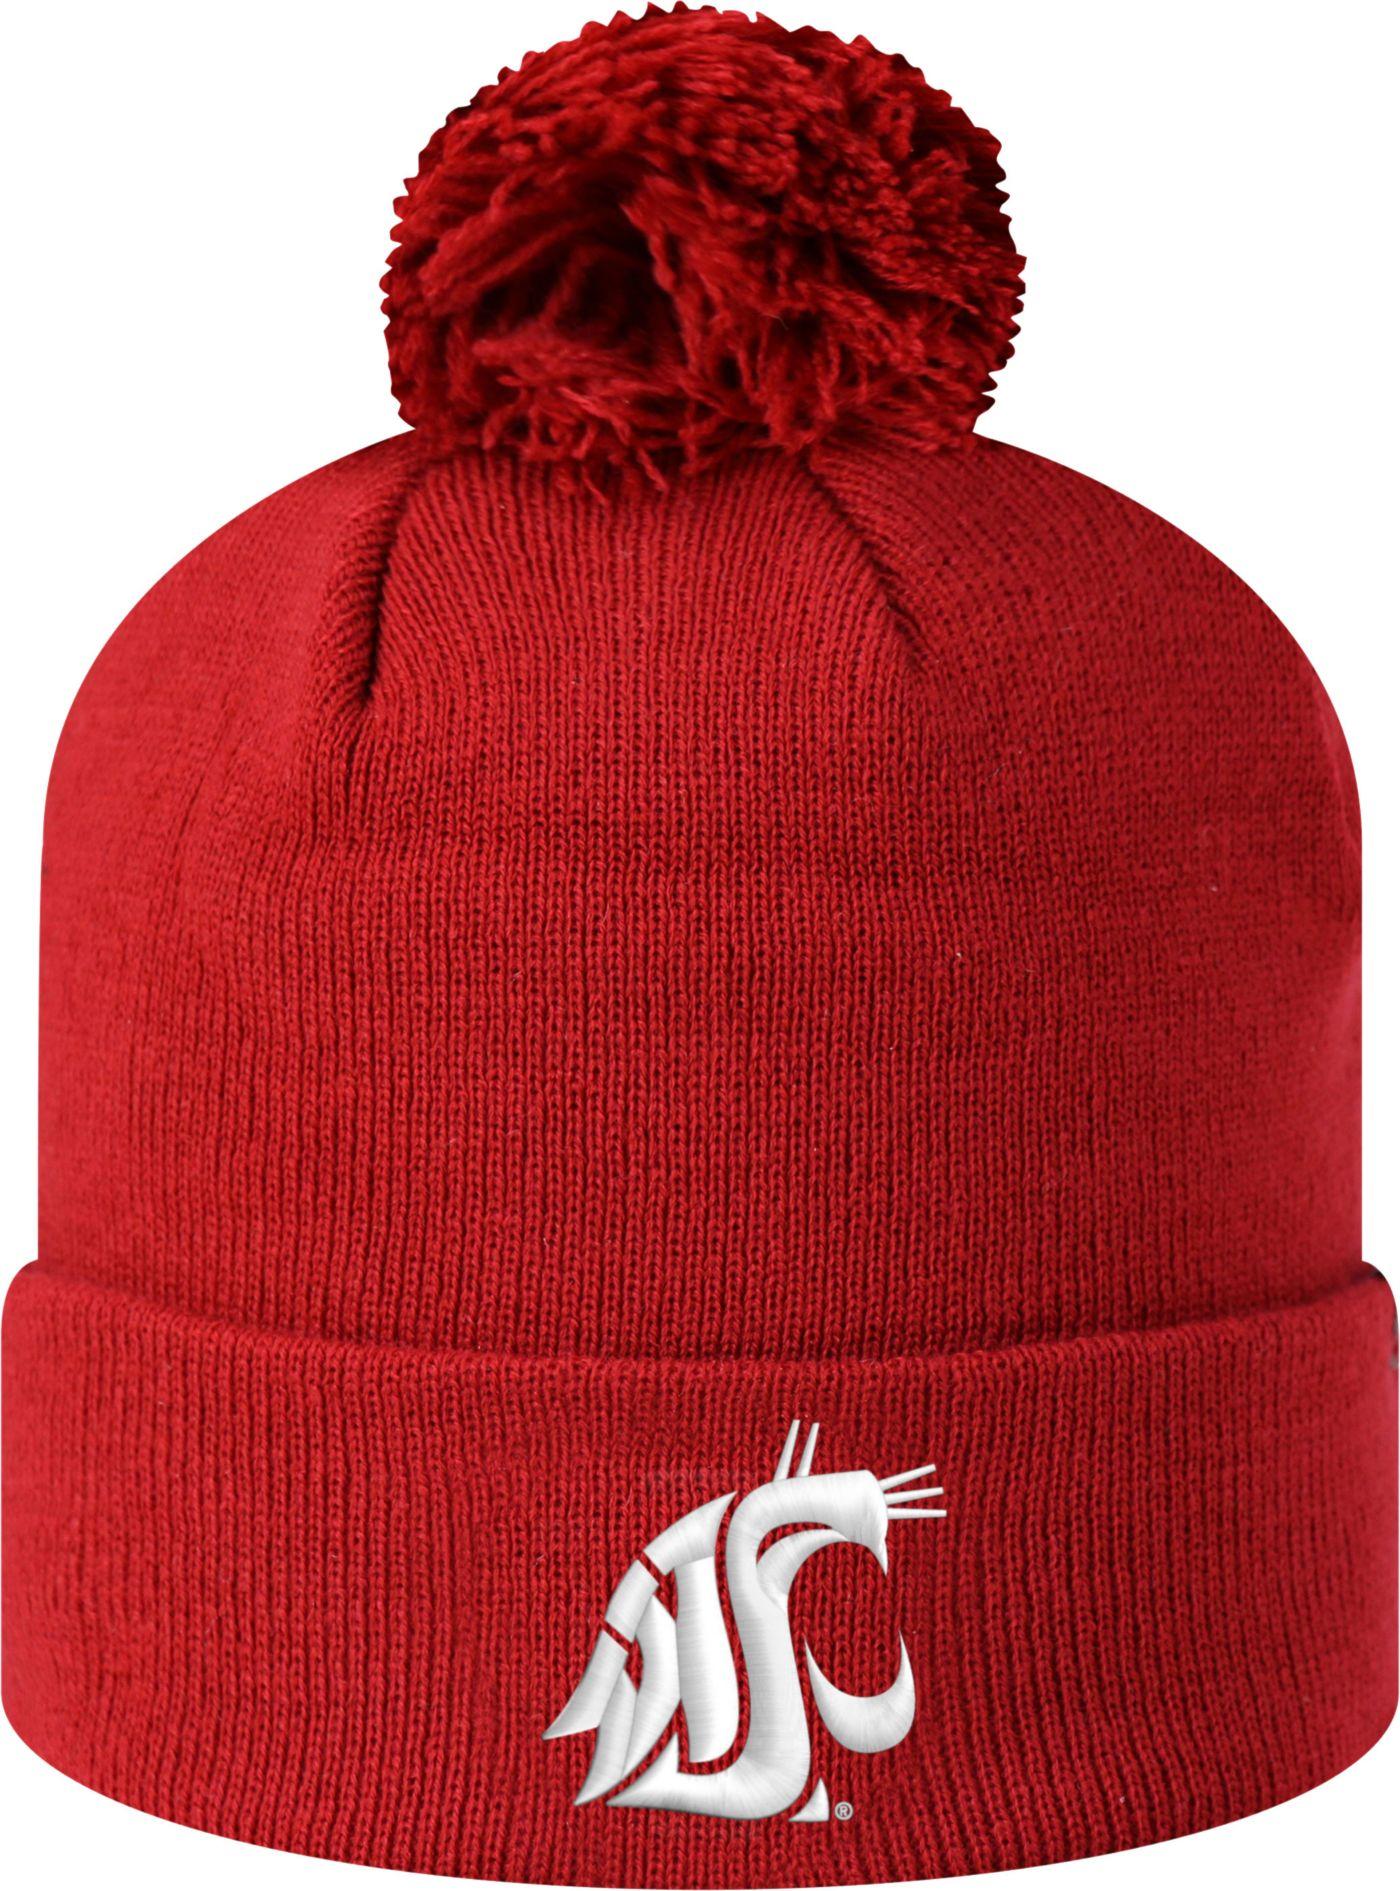 Top of the World Men's Washington State Cougars Crimson Pom Knit Beanie